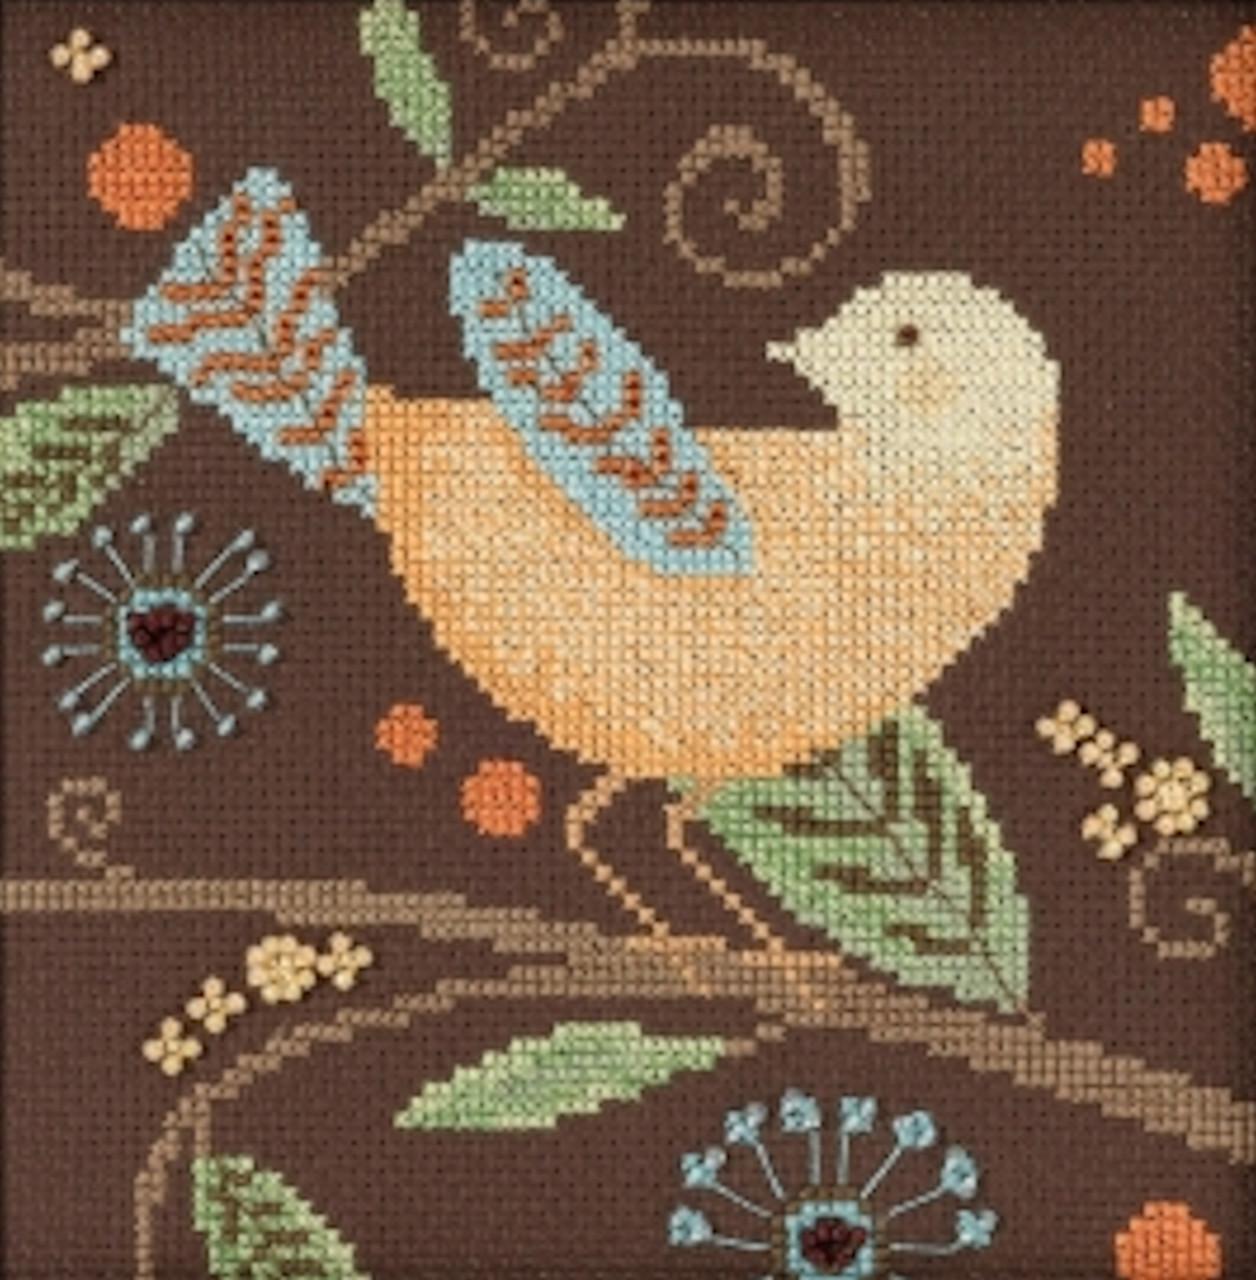 Mill Hill / Debbie Mumm -  Yellow Bird Out on a Limb